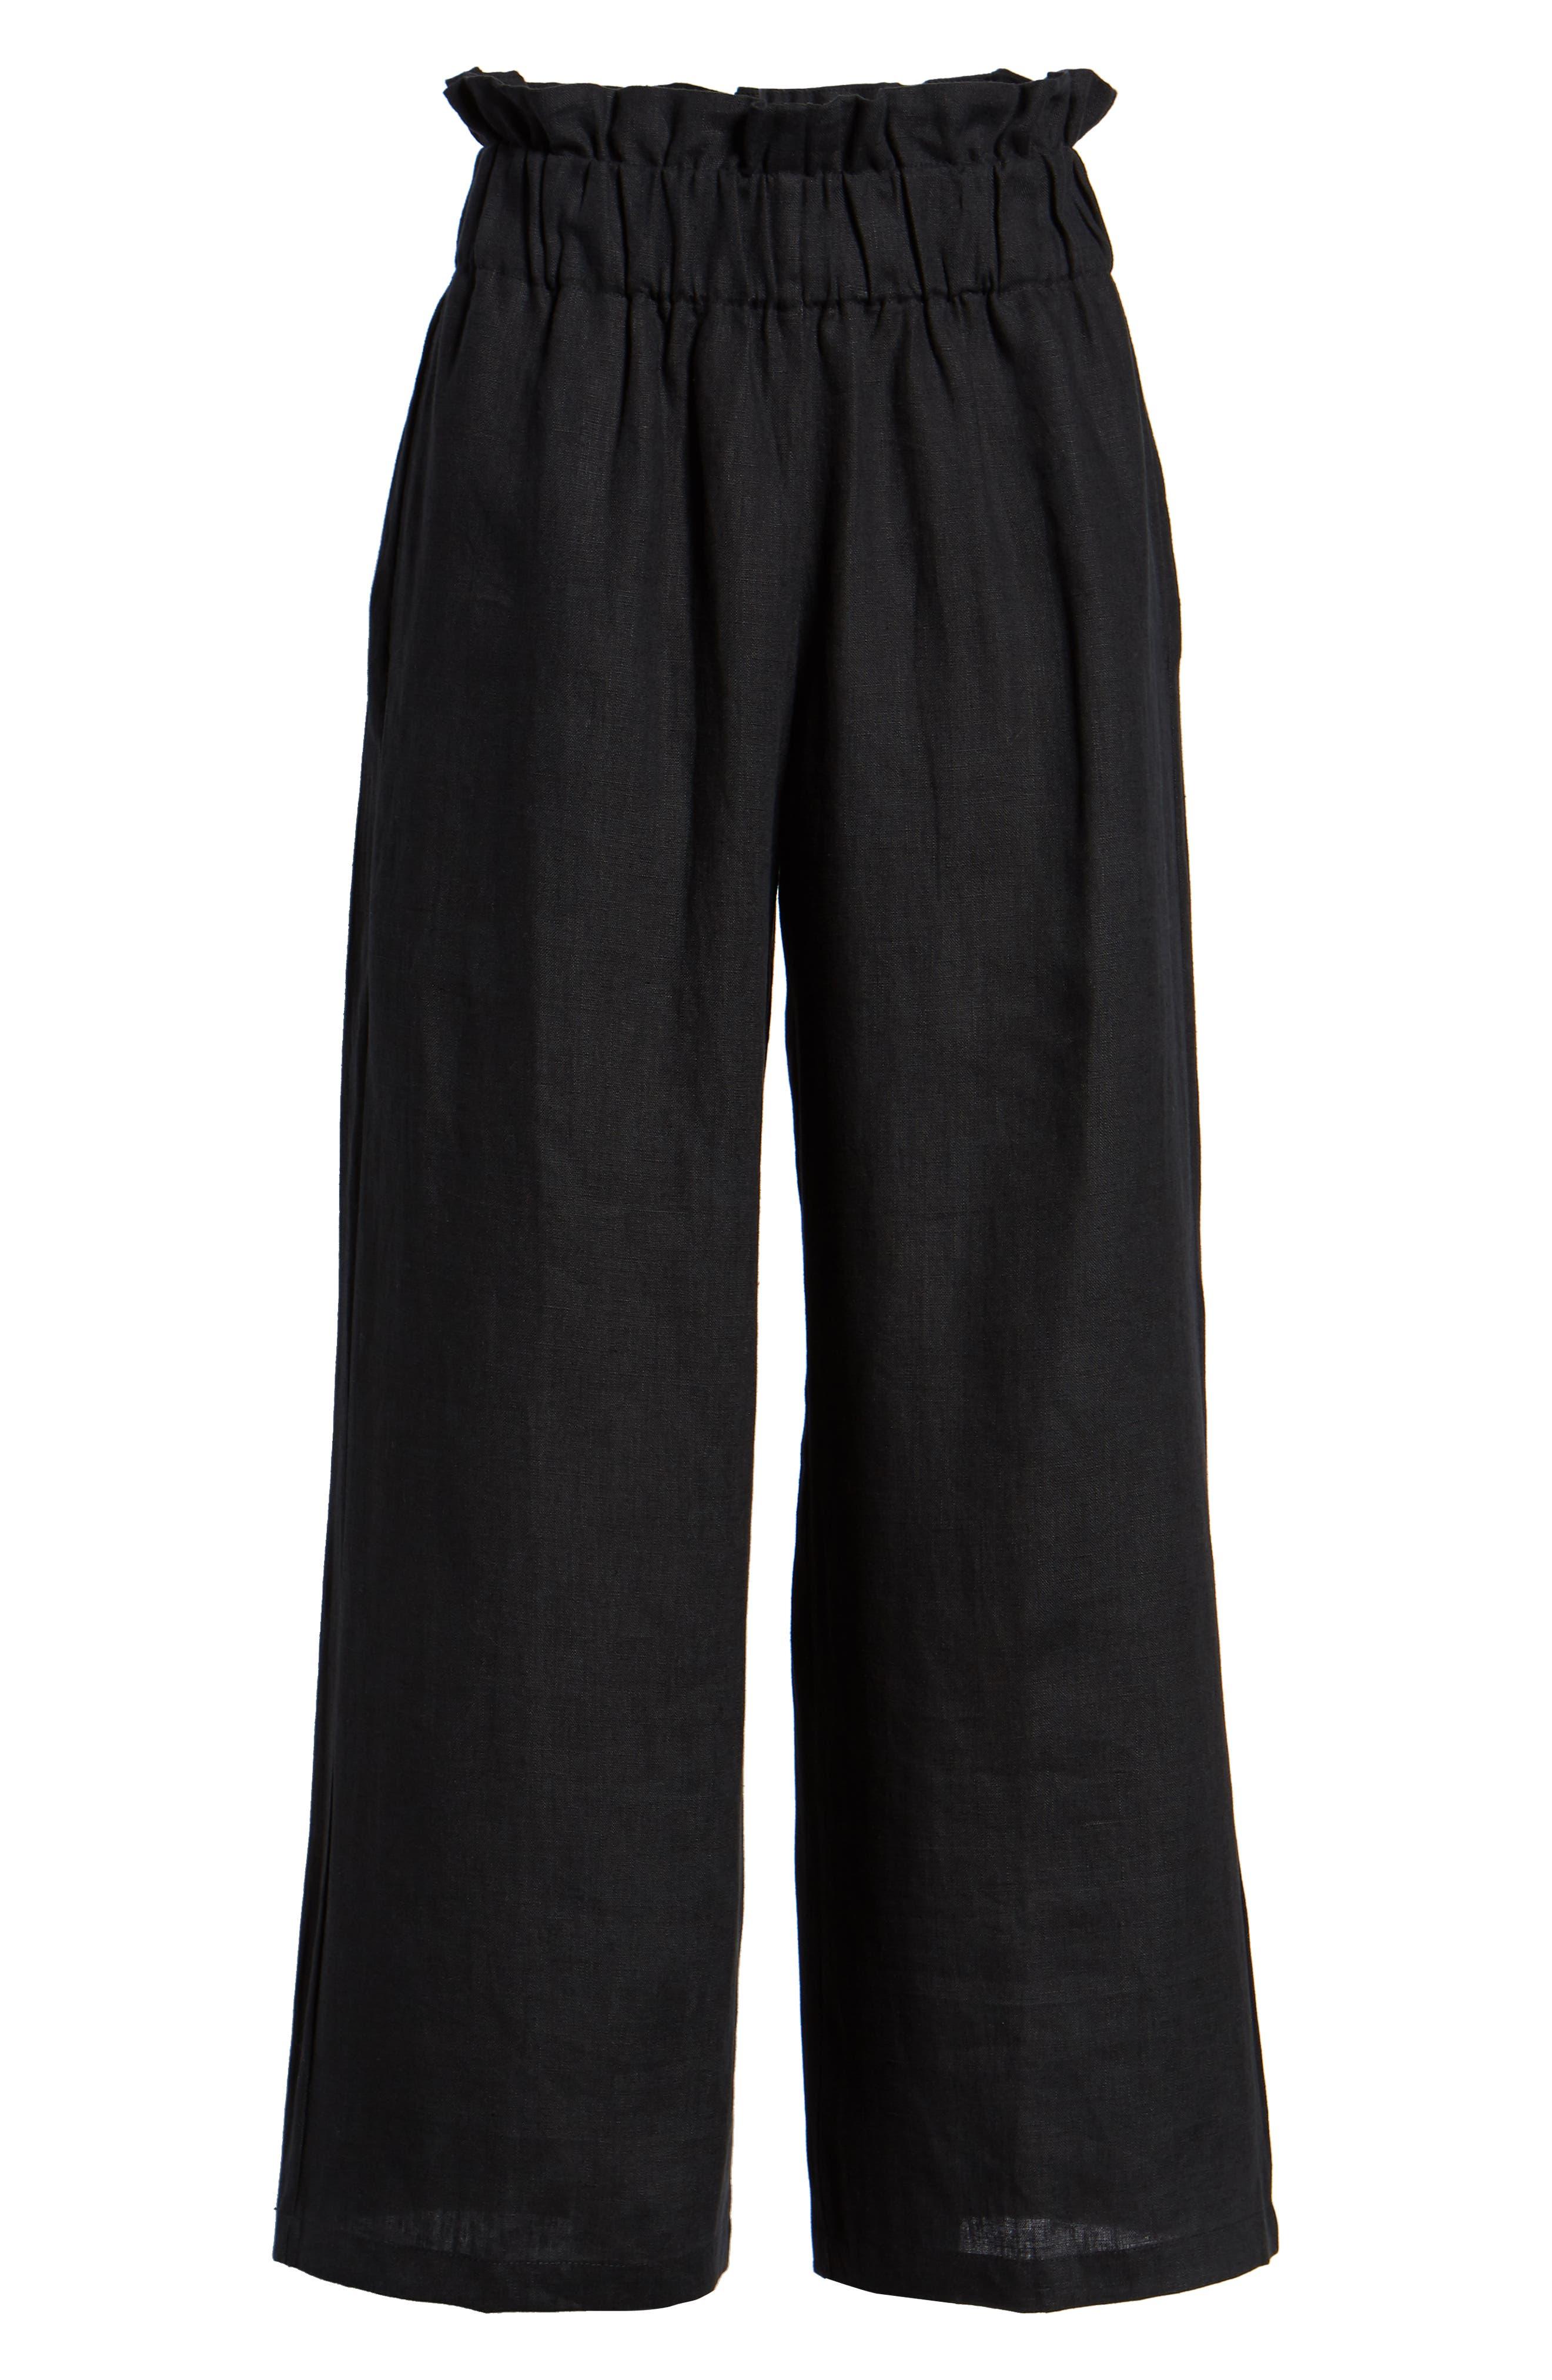 Varadero High Waist Linen Pants,                             Alternate thumbnail 7, color,                             001